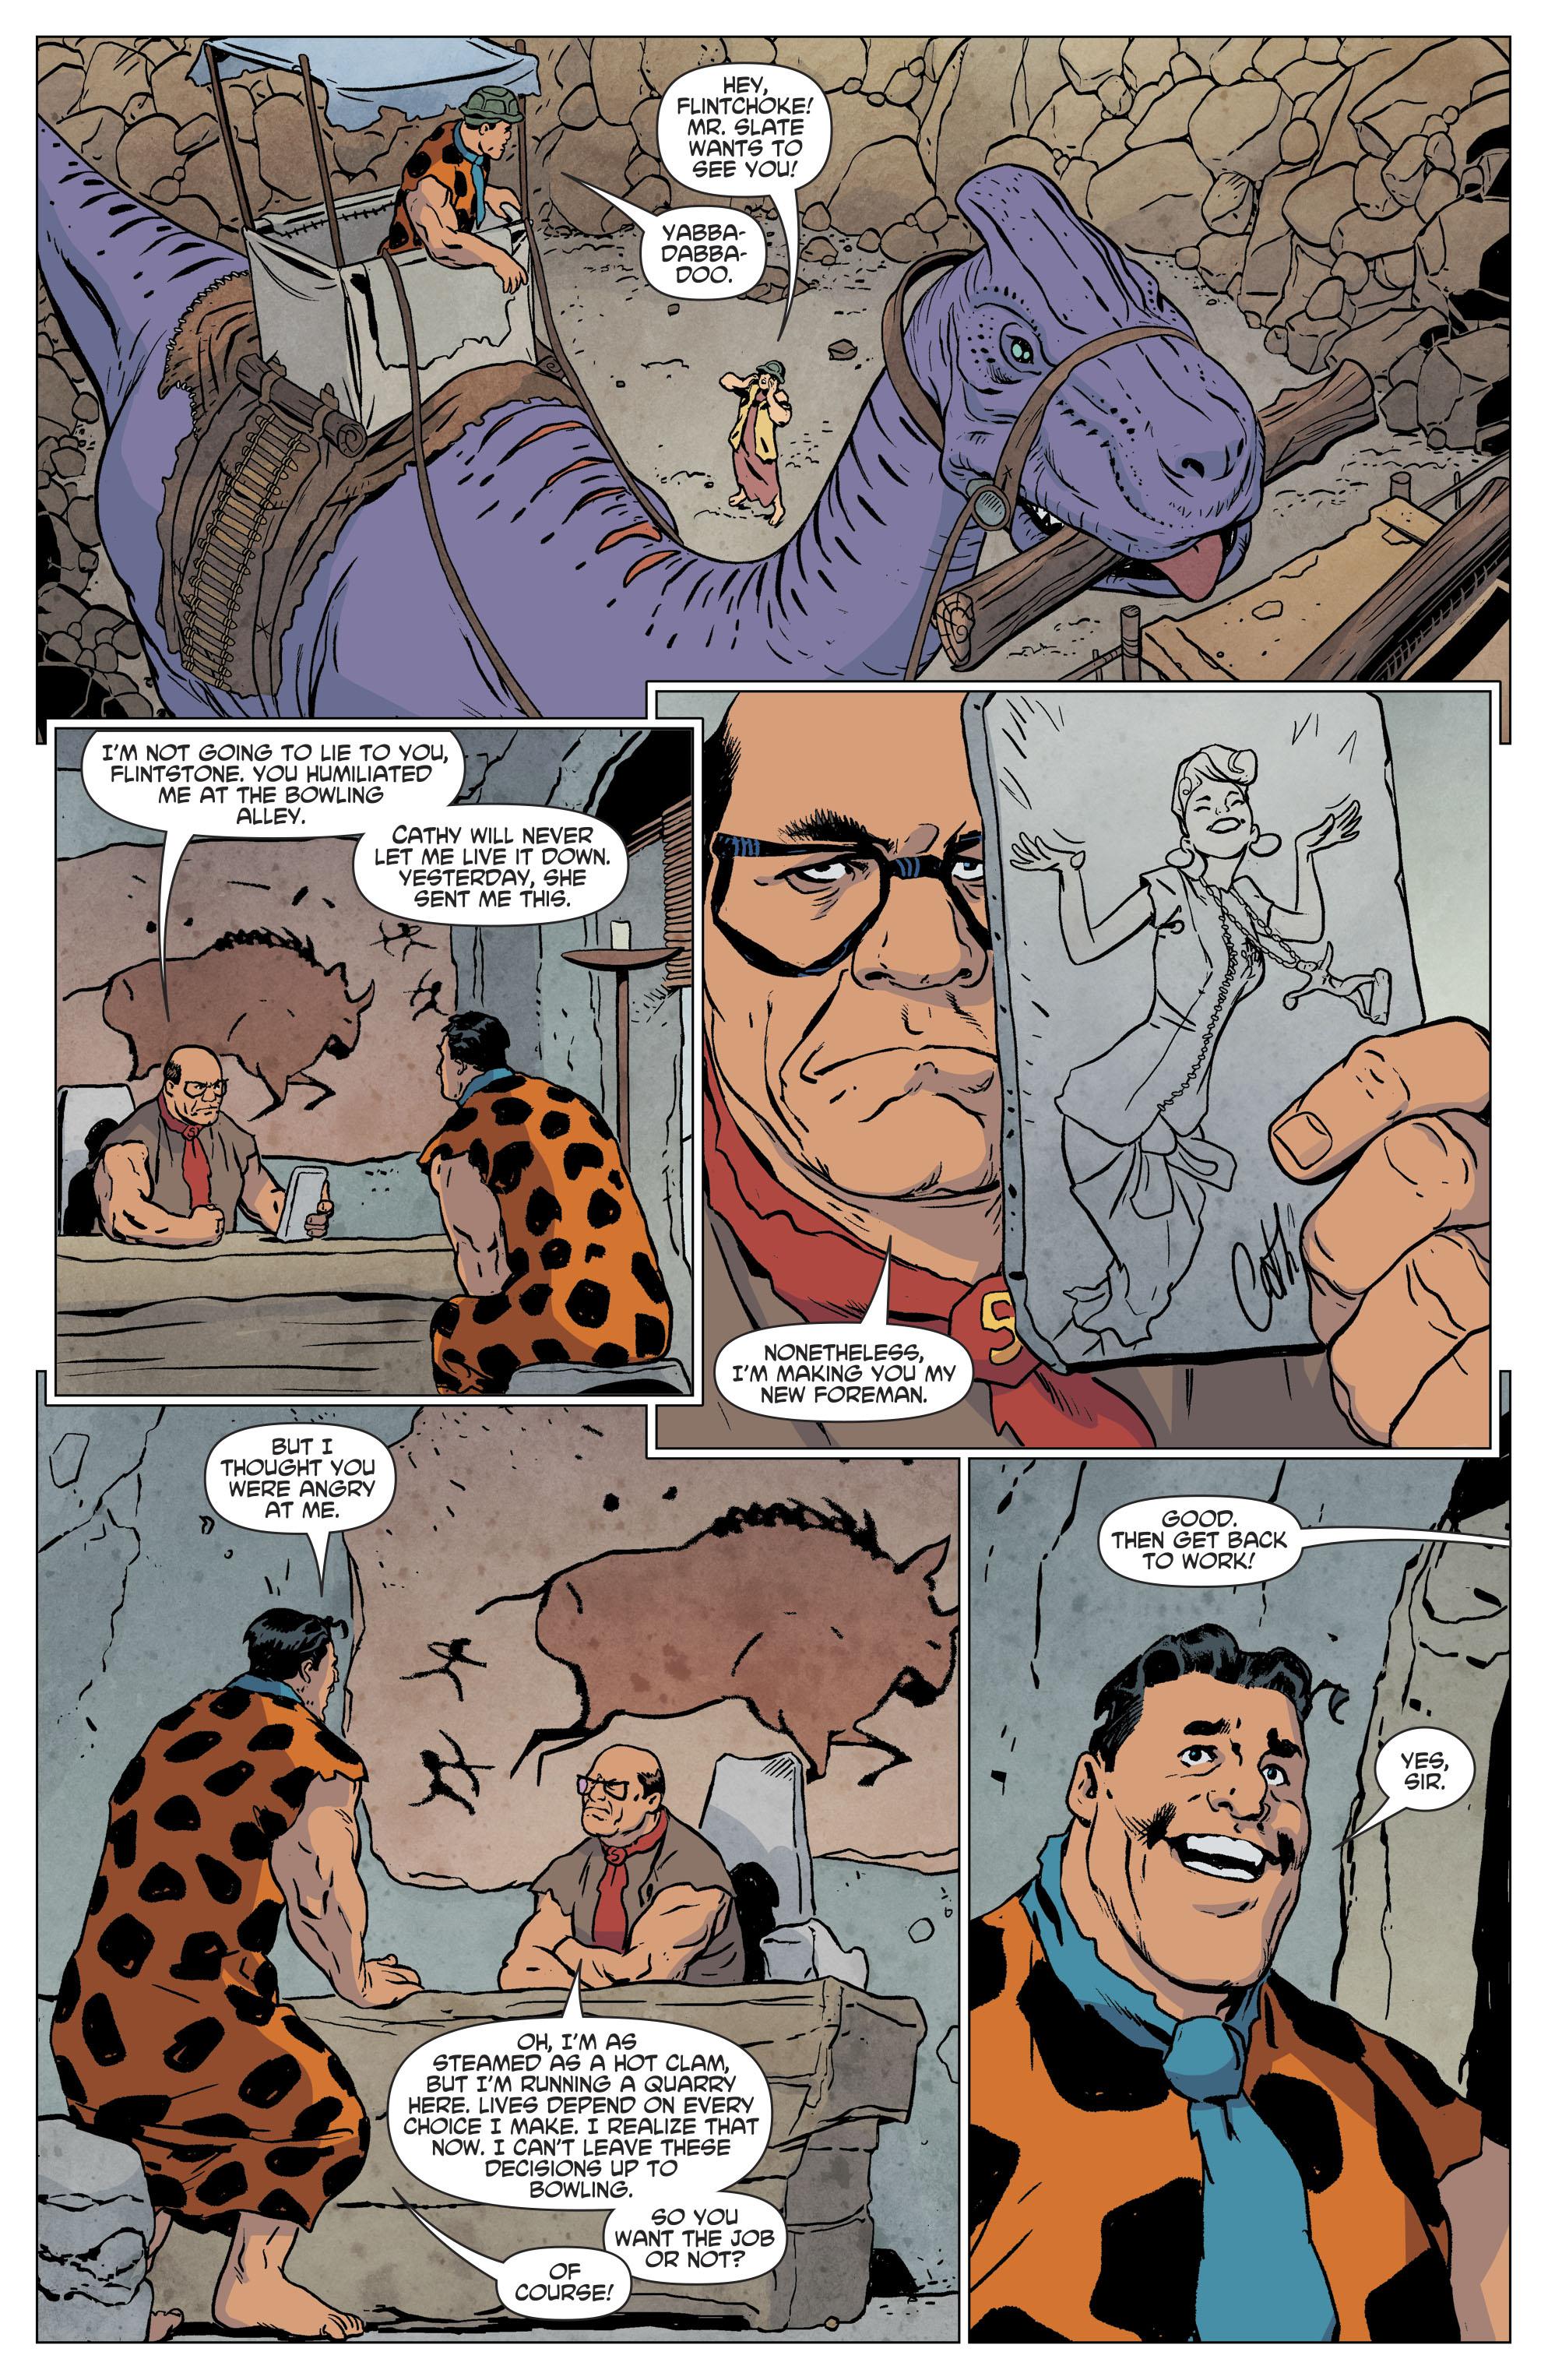 Read online The Flintstones comic -  Issue #12 - 23